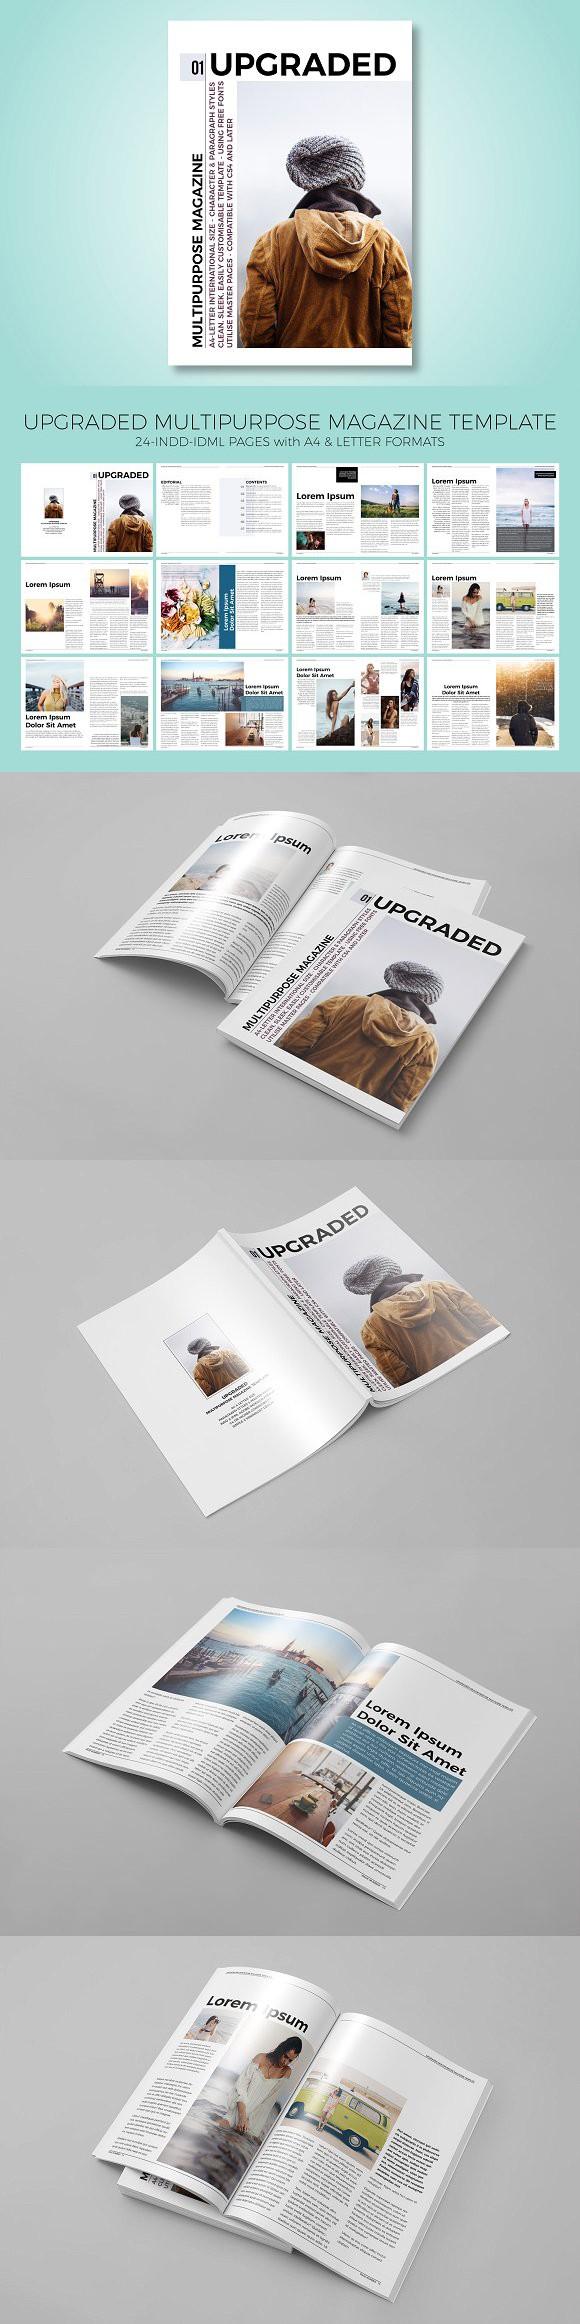 Upgraded Magazine Template. Magazine Templates | Magazine Templates ...